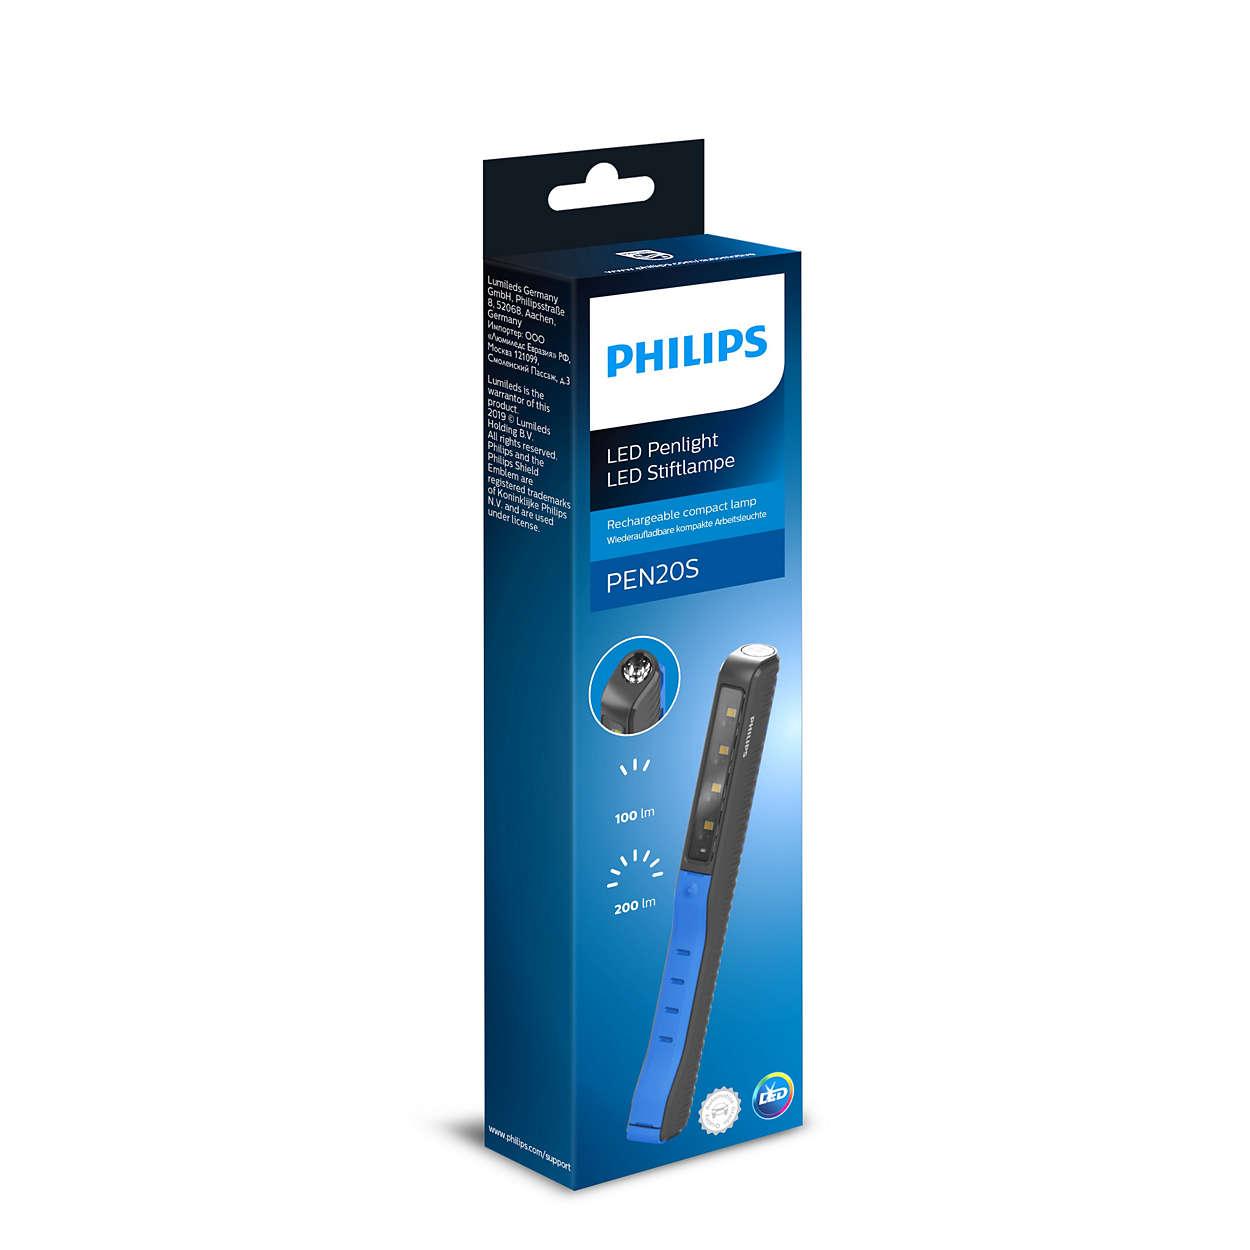 Висококачествена LUXEON® LED акумулаторна компактна лампа